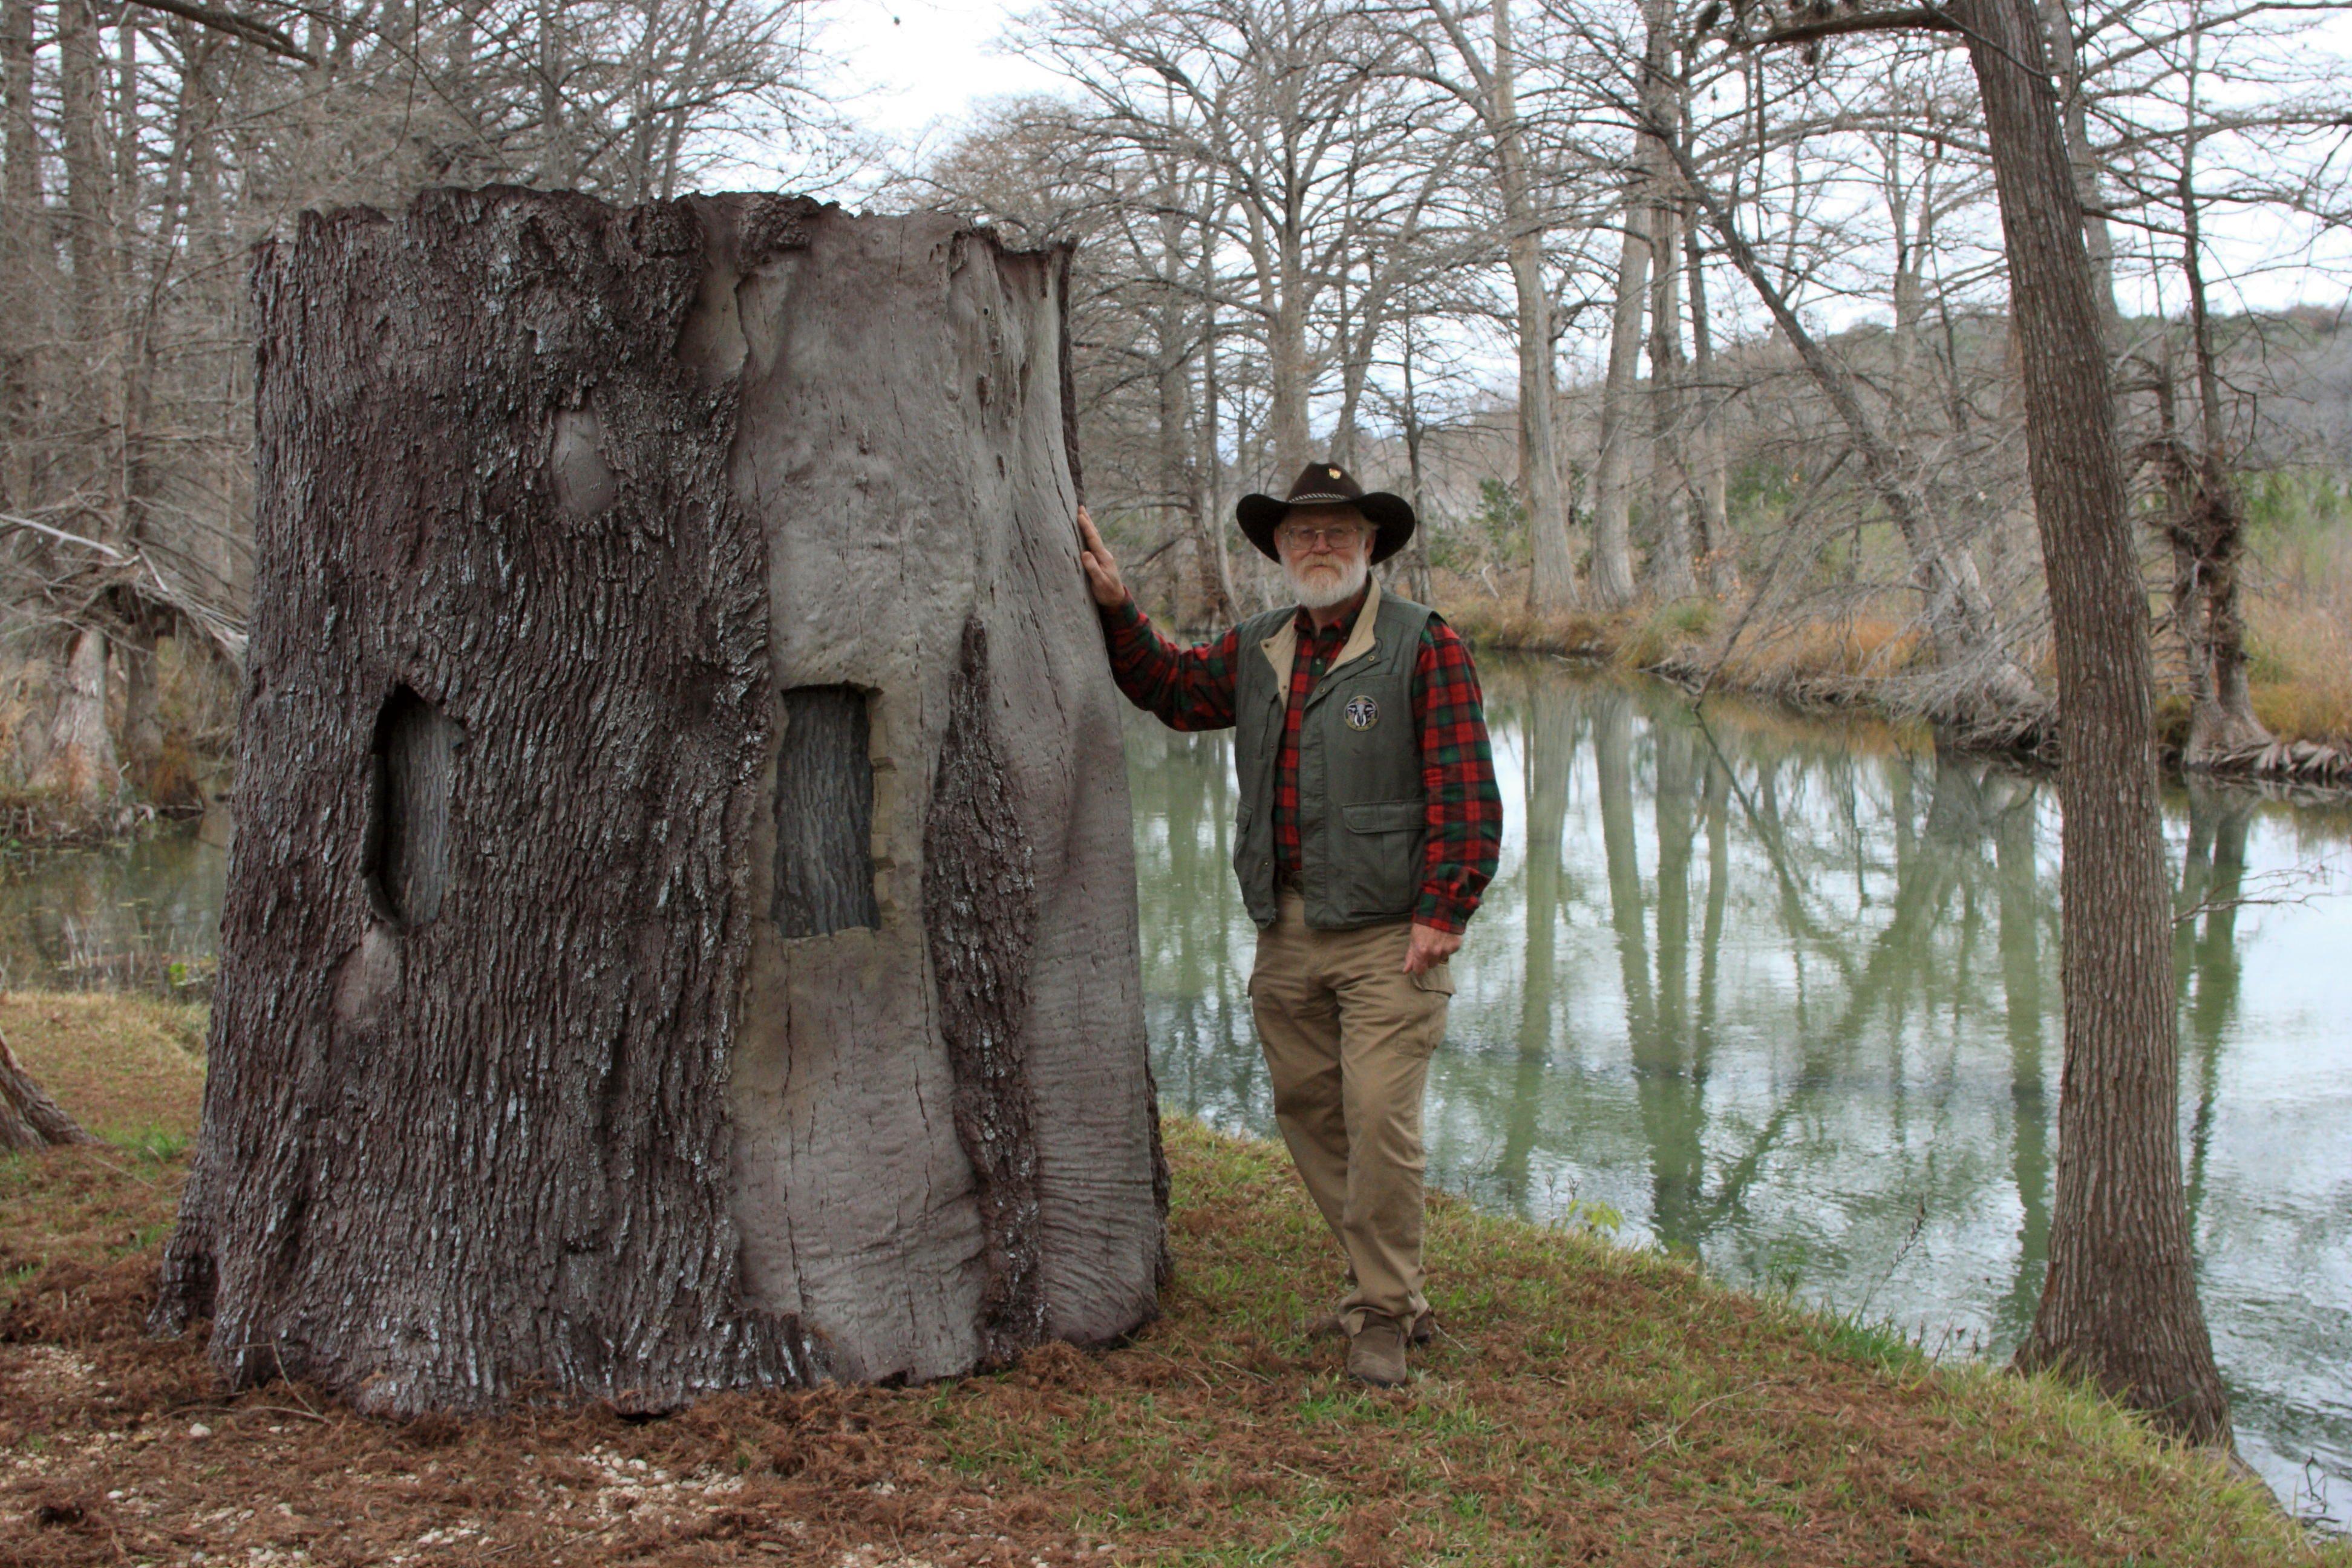 The Treeblind Tm Ground Blind Looks Just Like A Giant